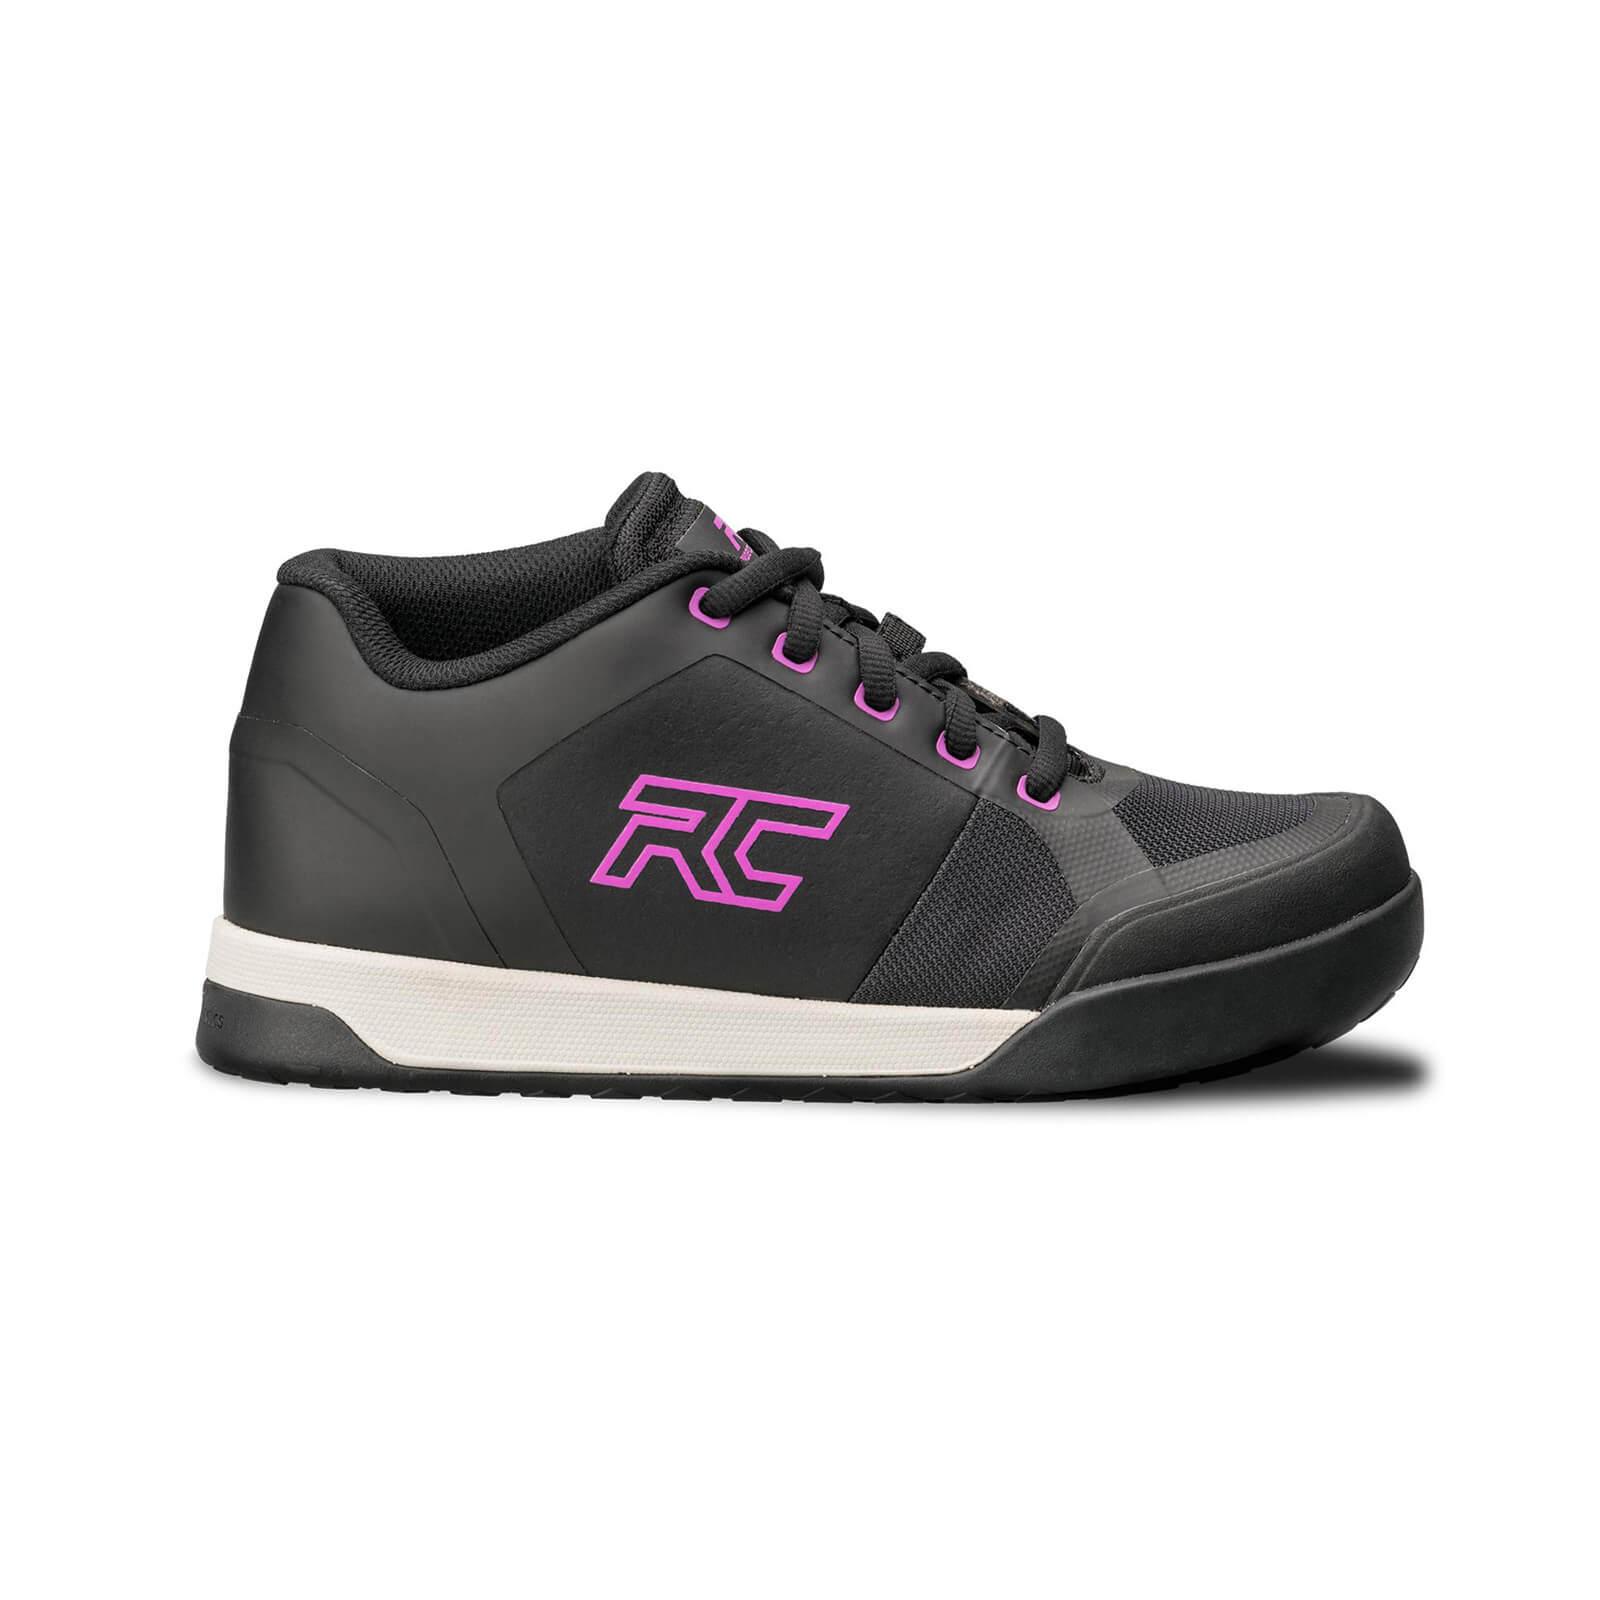 Ride Concepts Womens Skyline Flat Mtb Shoes - Black/purple - Uk 4/eu 35